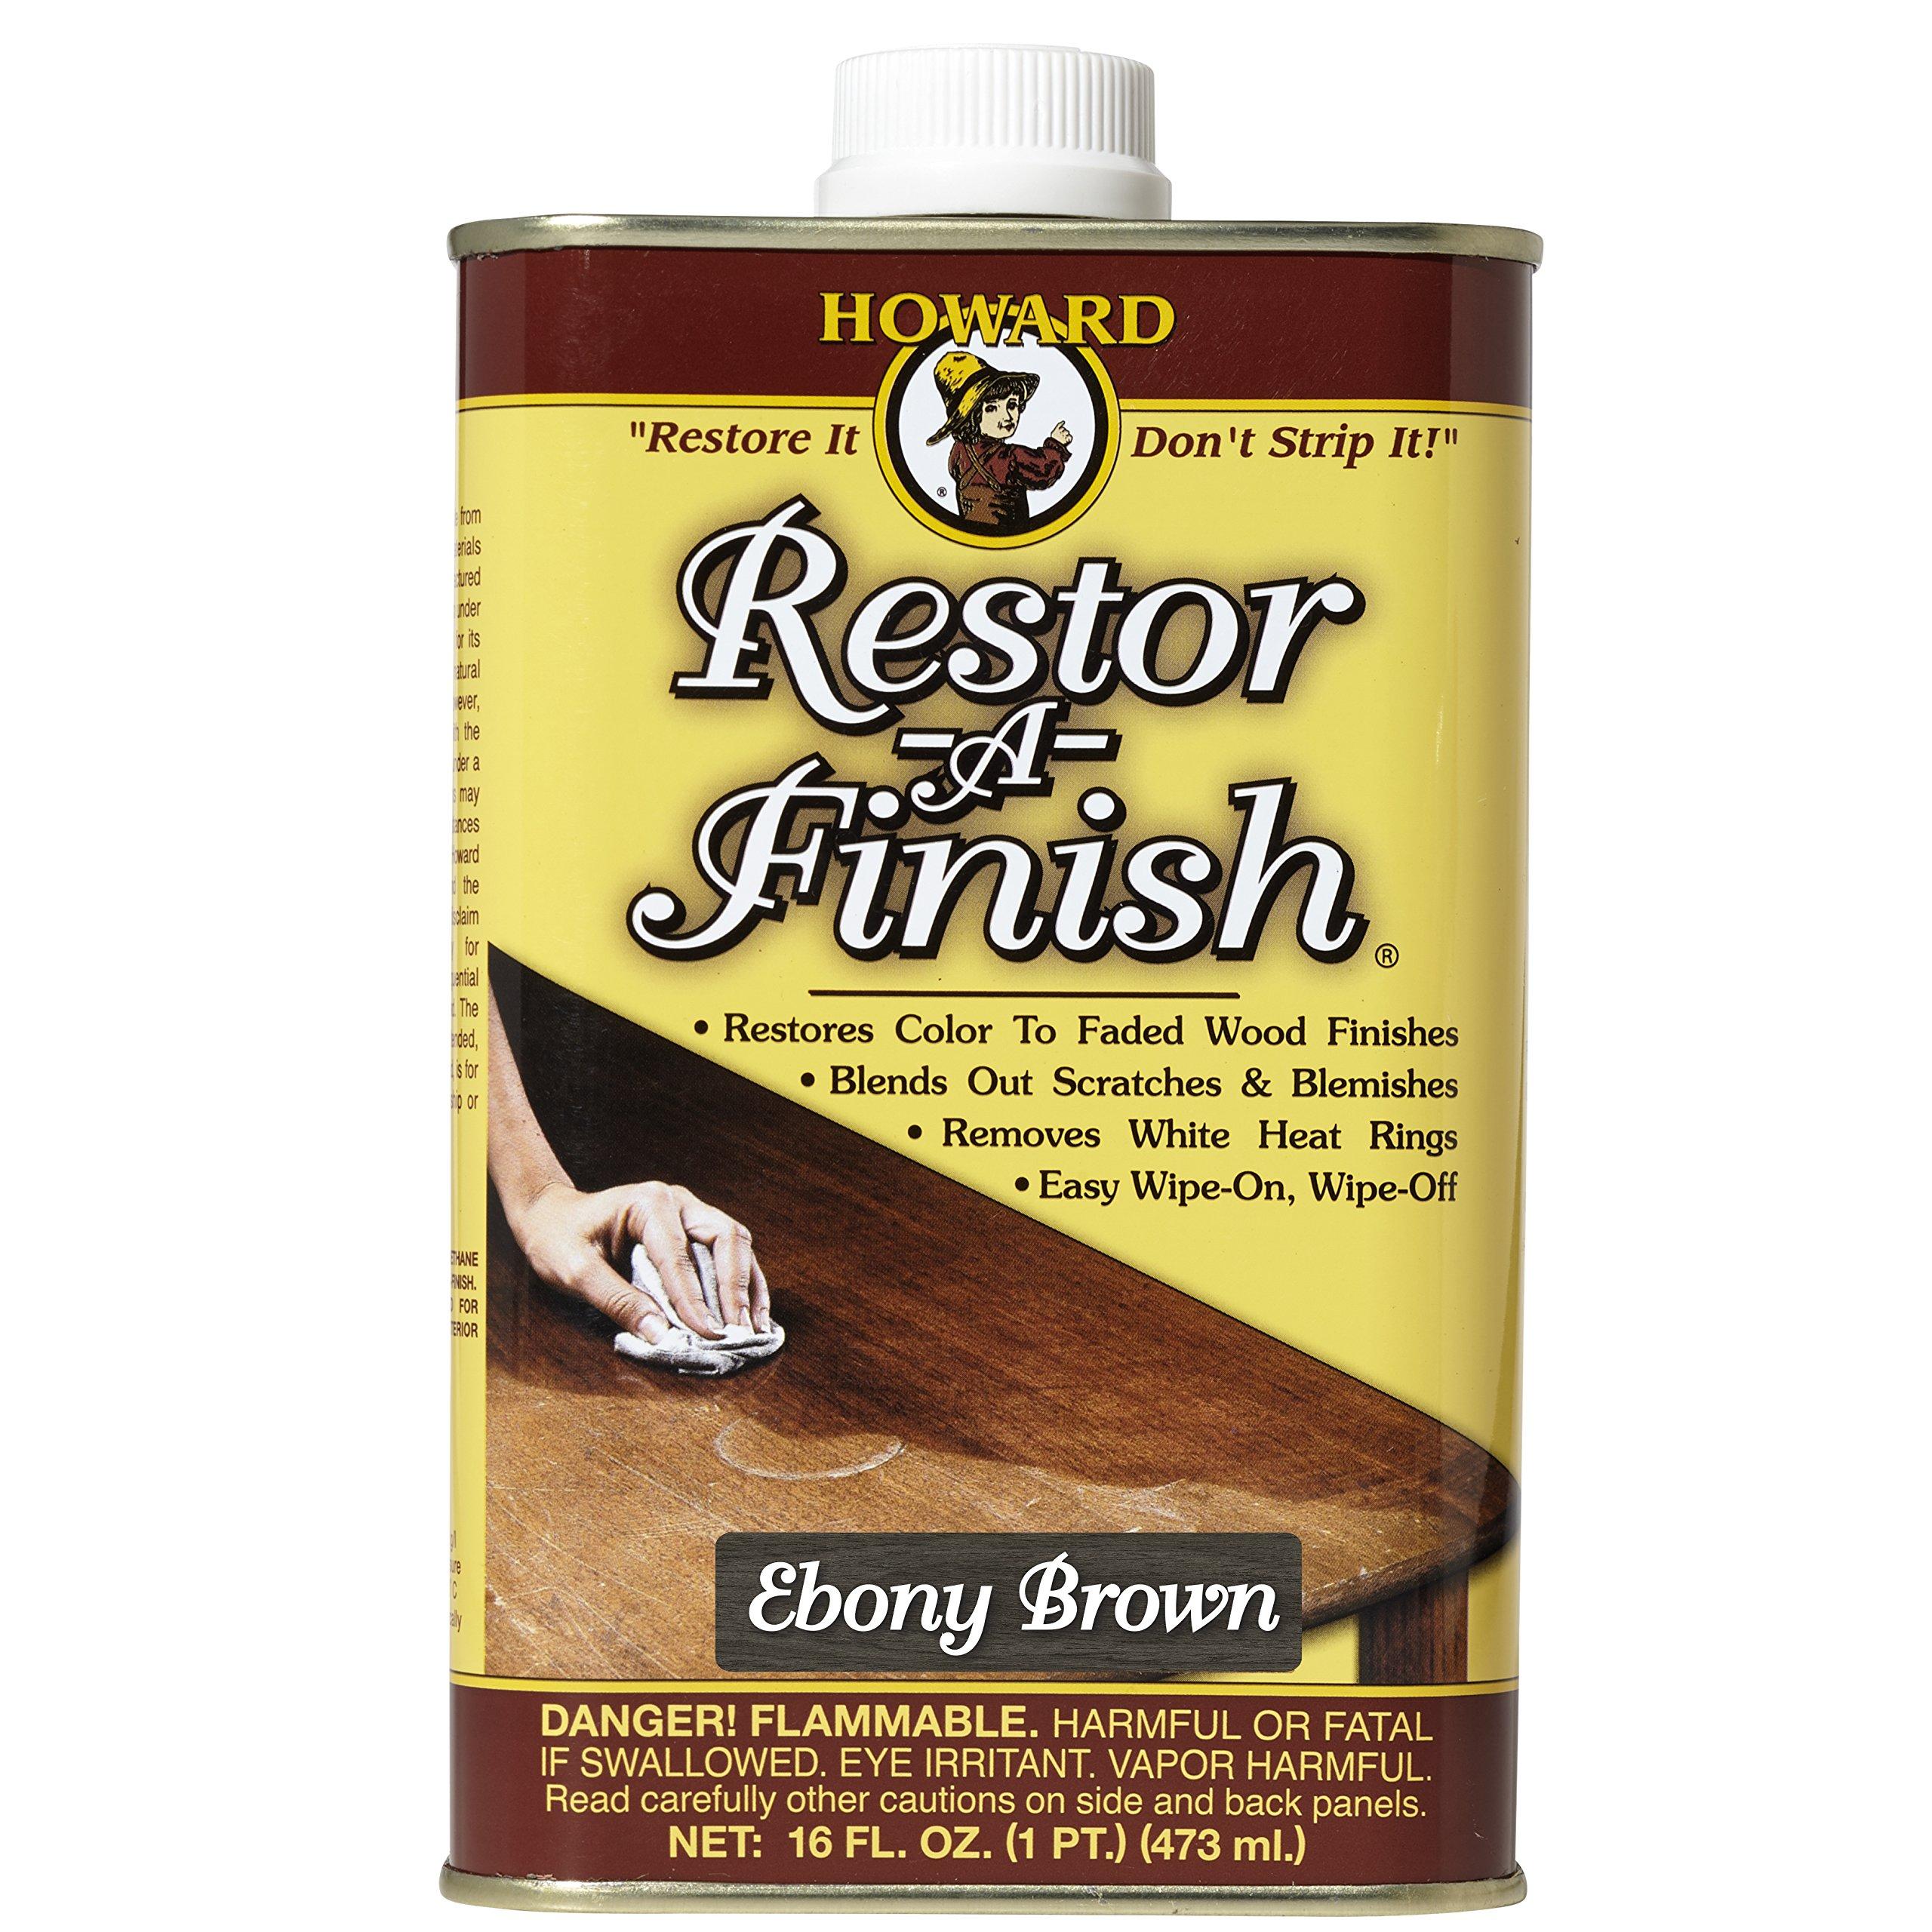 Howard RF8016 Restor-A-Finish, 16-Ounce, Ebony Brown